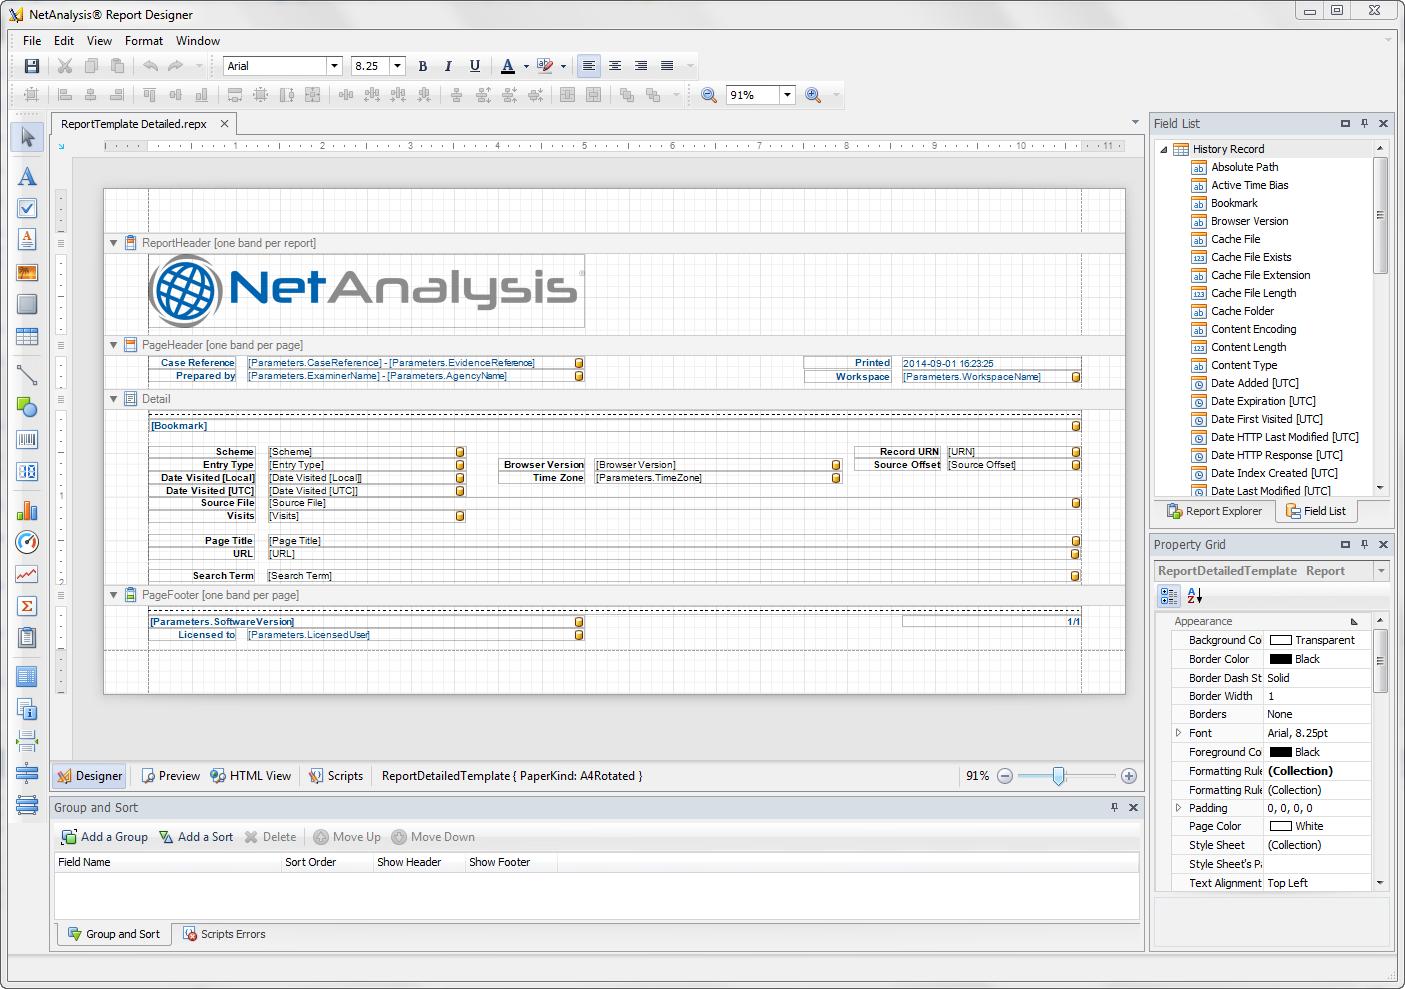 Digital Detective NetAnalysis® report designer screen with a report being edited